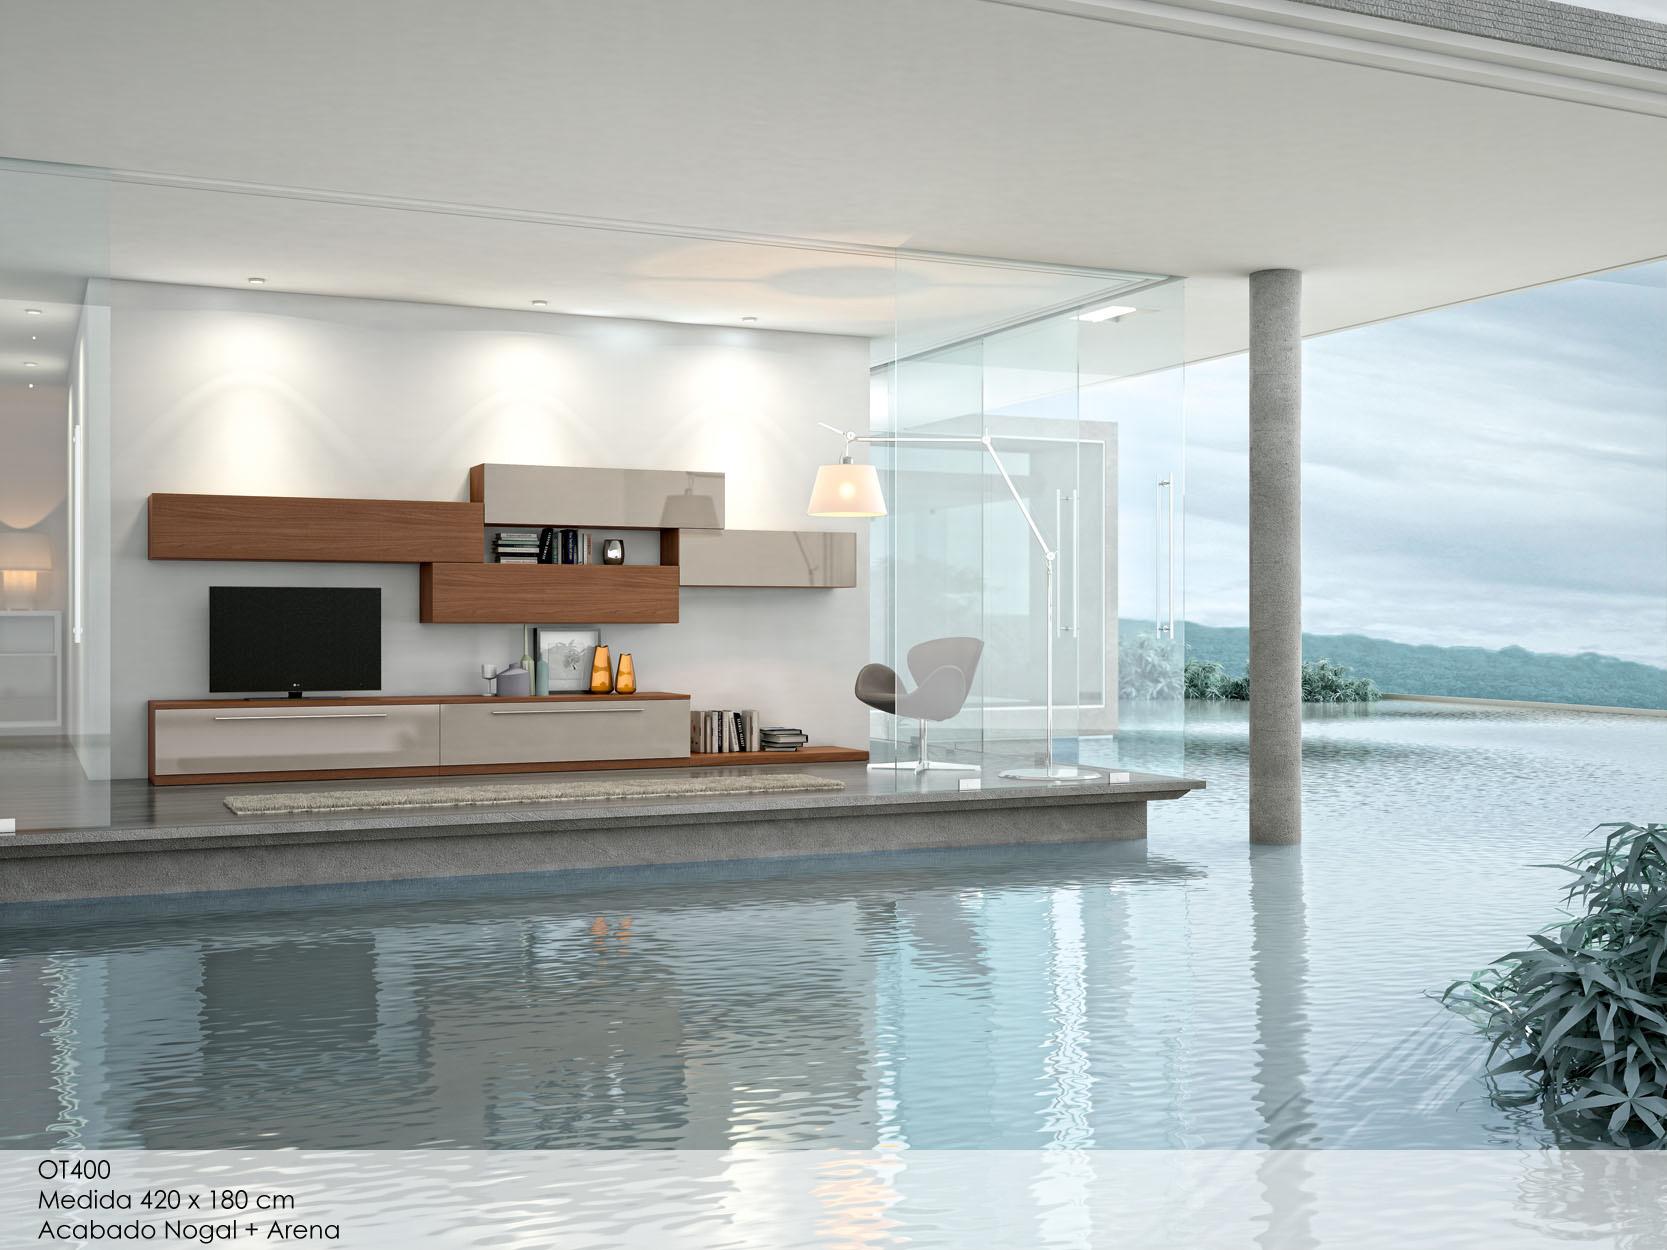 301 moved permanently - Iluminacion salones modernos ...